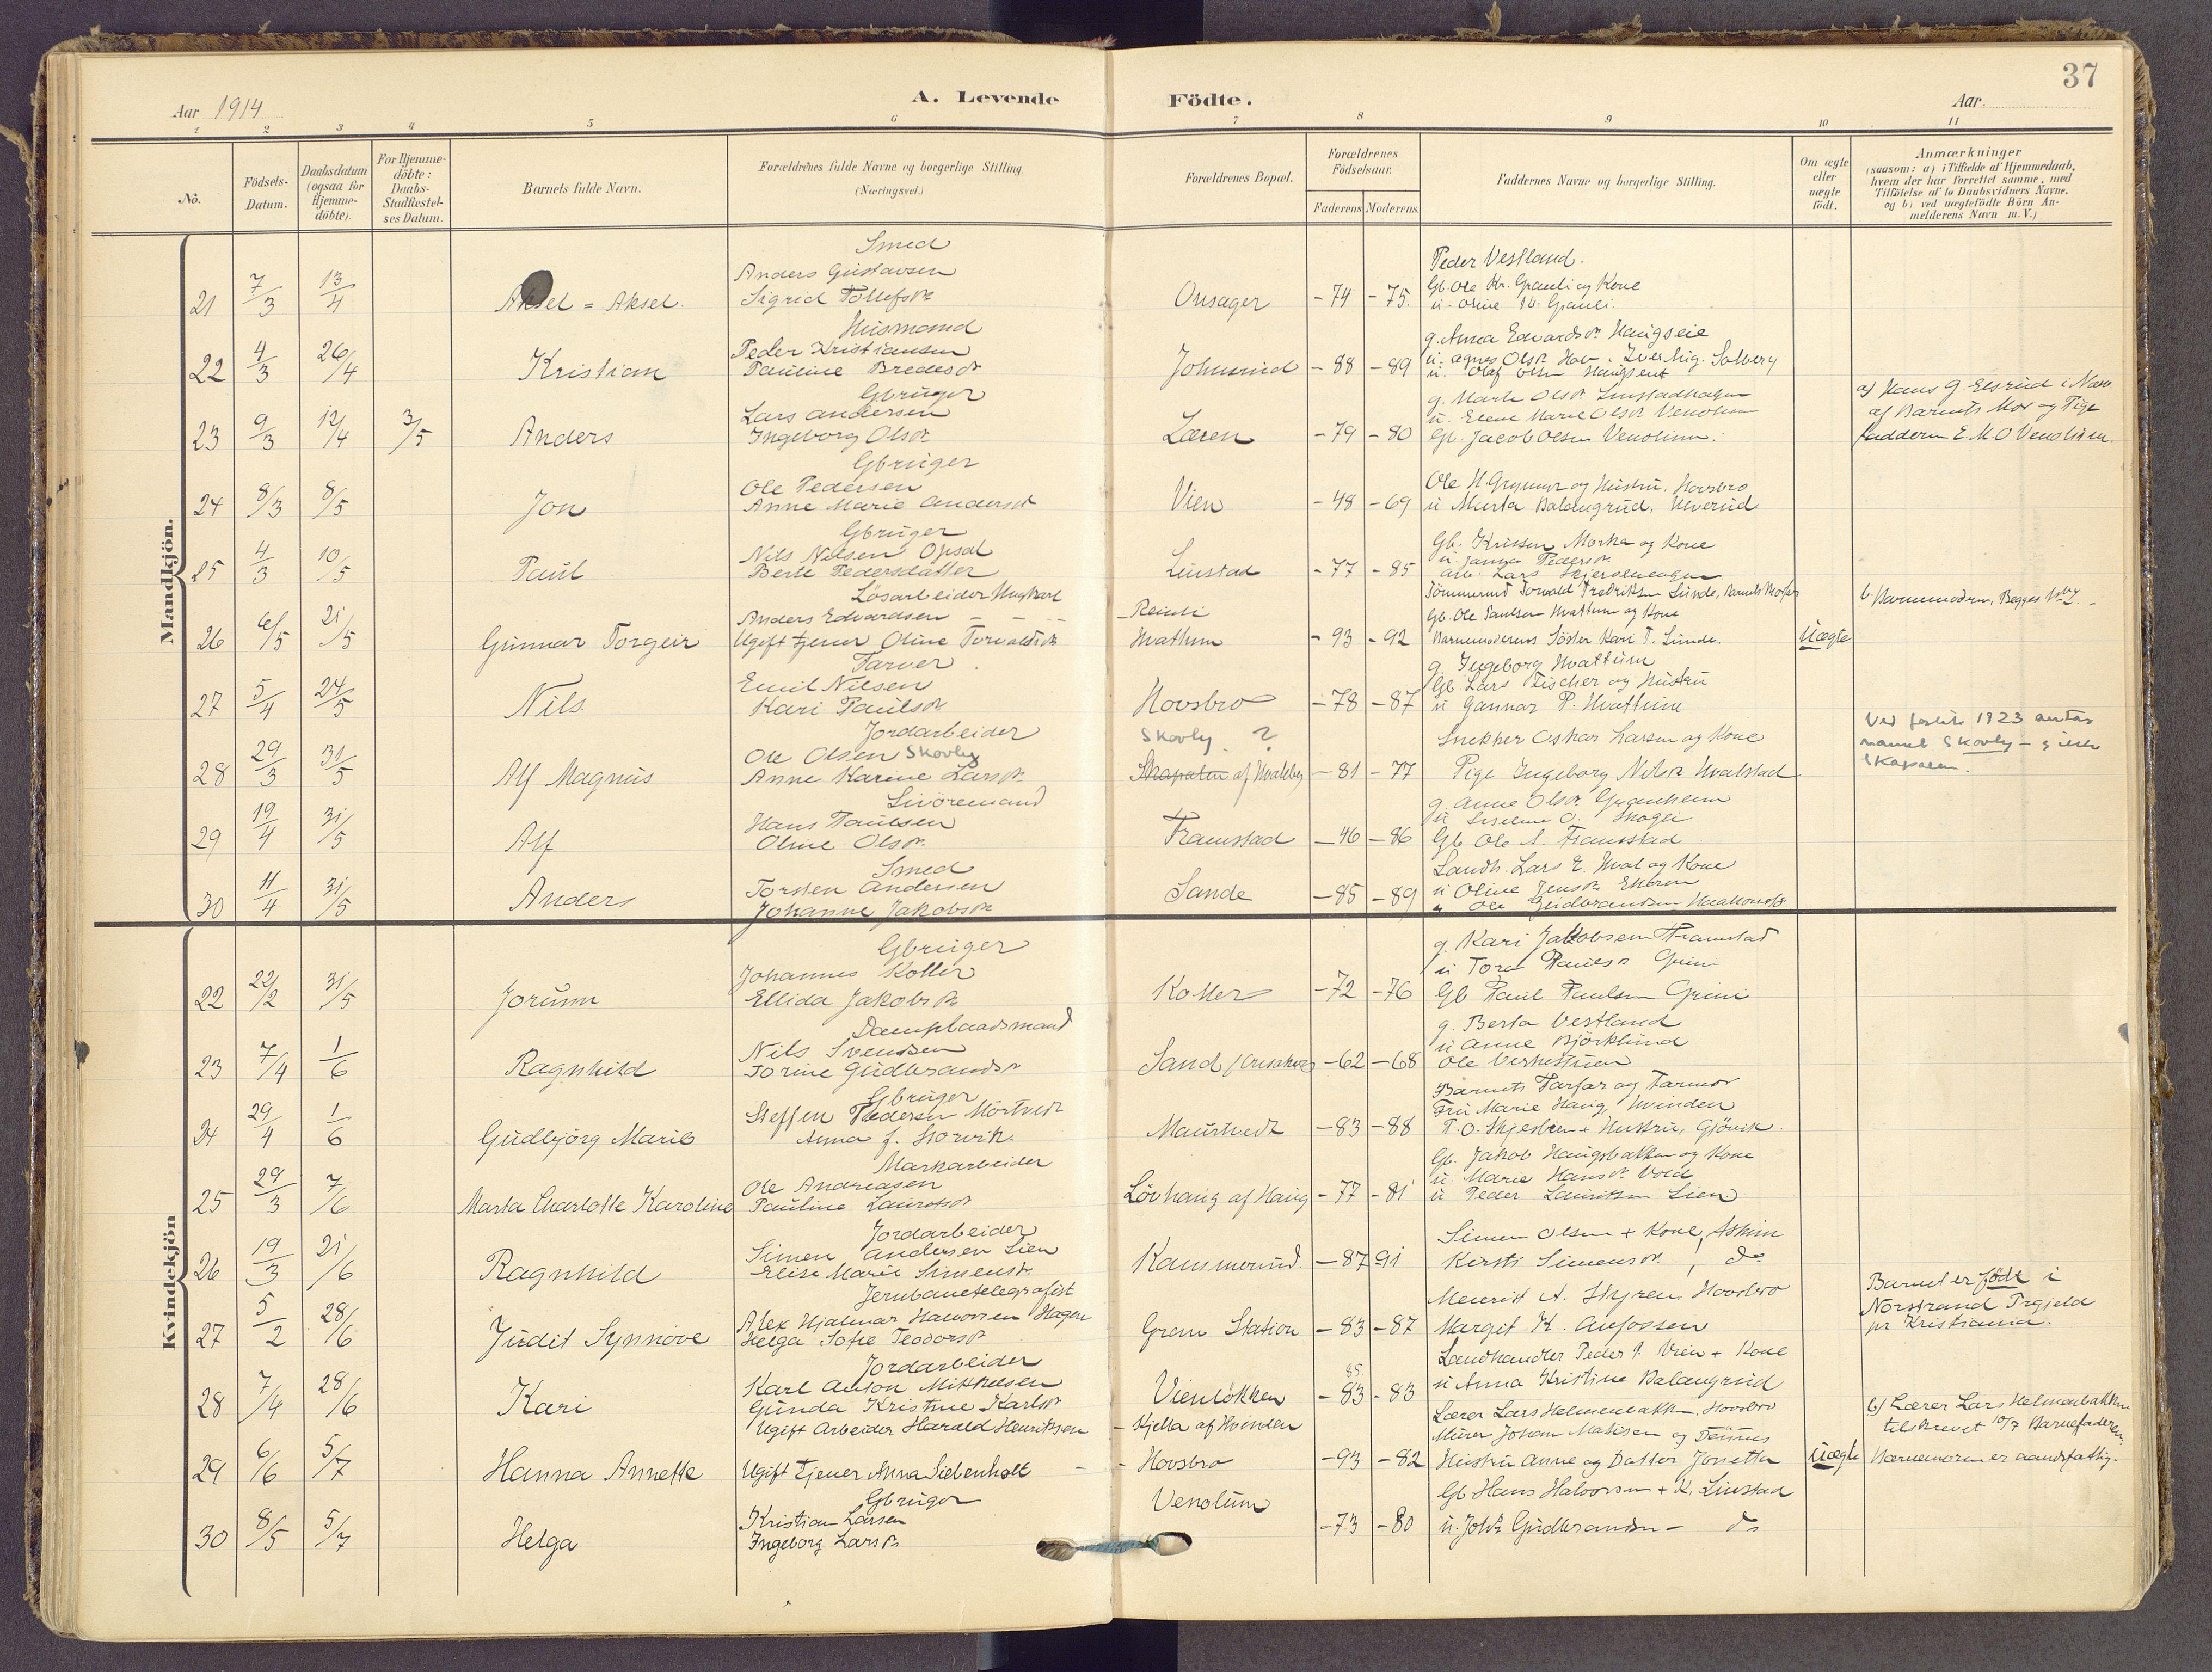 SAH, Gran prestekontor, Ministerialbok nr. 21, 1908-1932, s. 37